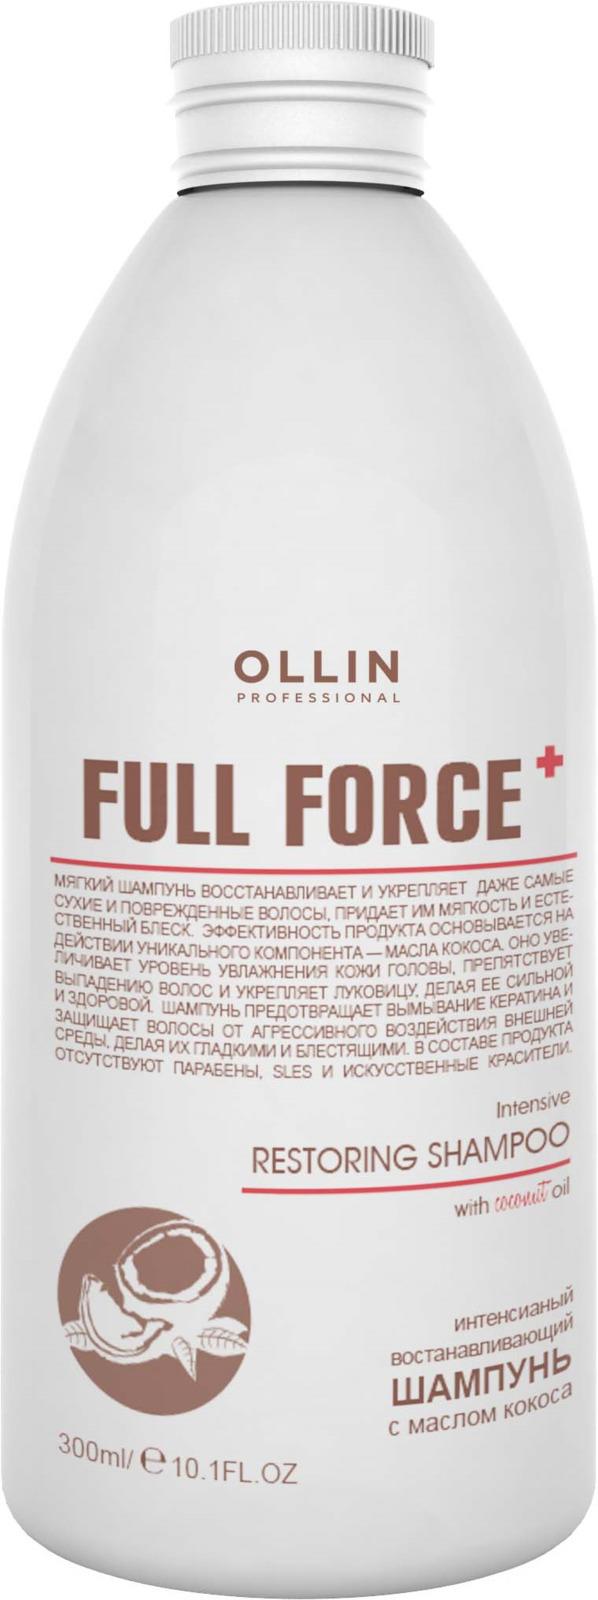 Ollin Интенсивный восстанавливающий шампунь с маслом кокоса Full Force Intensive Restoring Shampoo 300 мл ollin bionika men shampoo conditioner restoring шампунь кондиционер восстанавливающий 250 мл